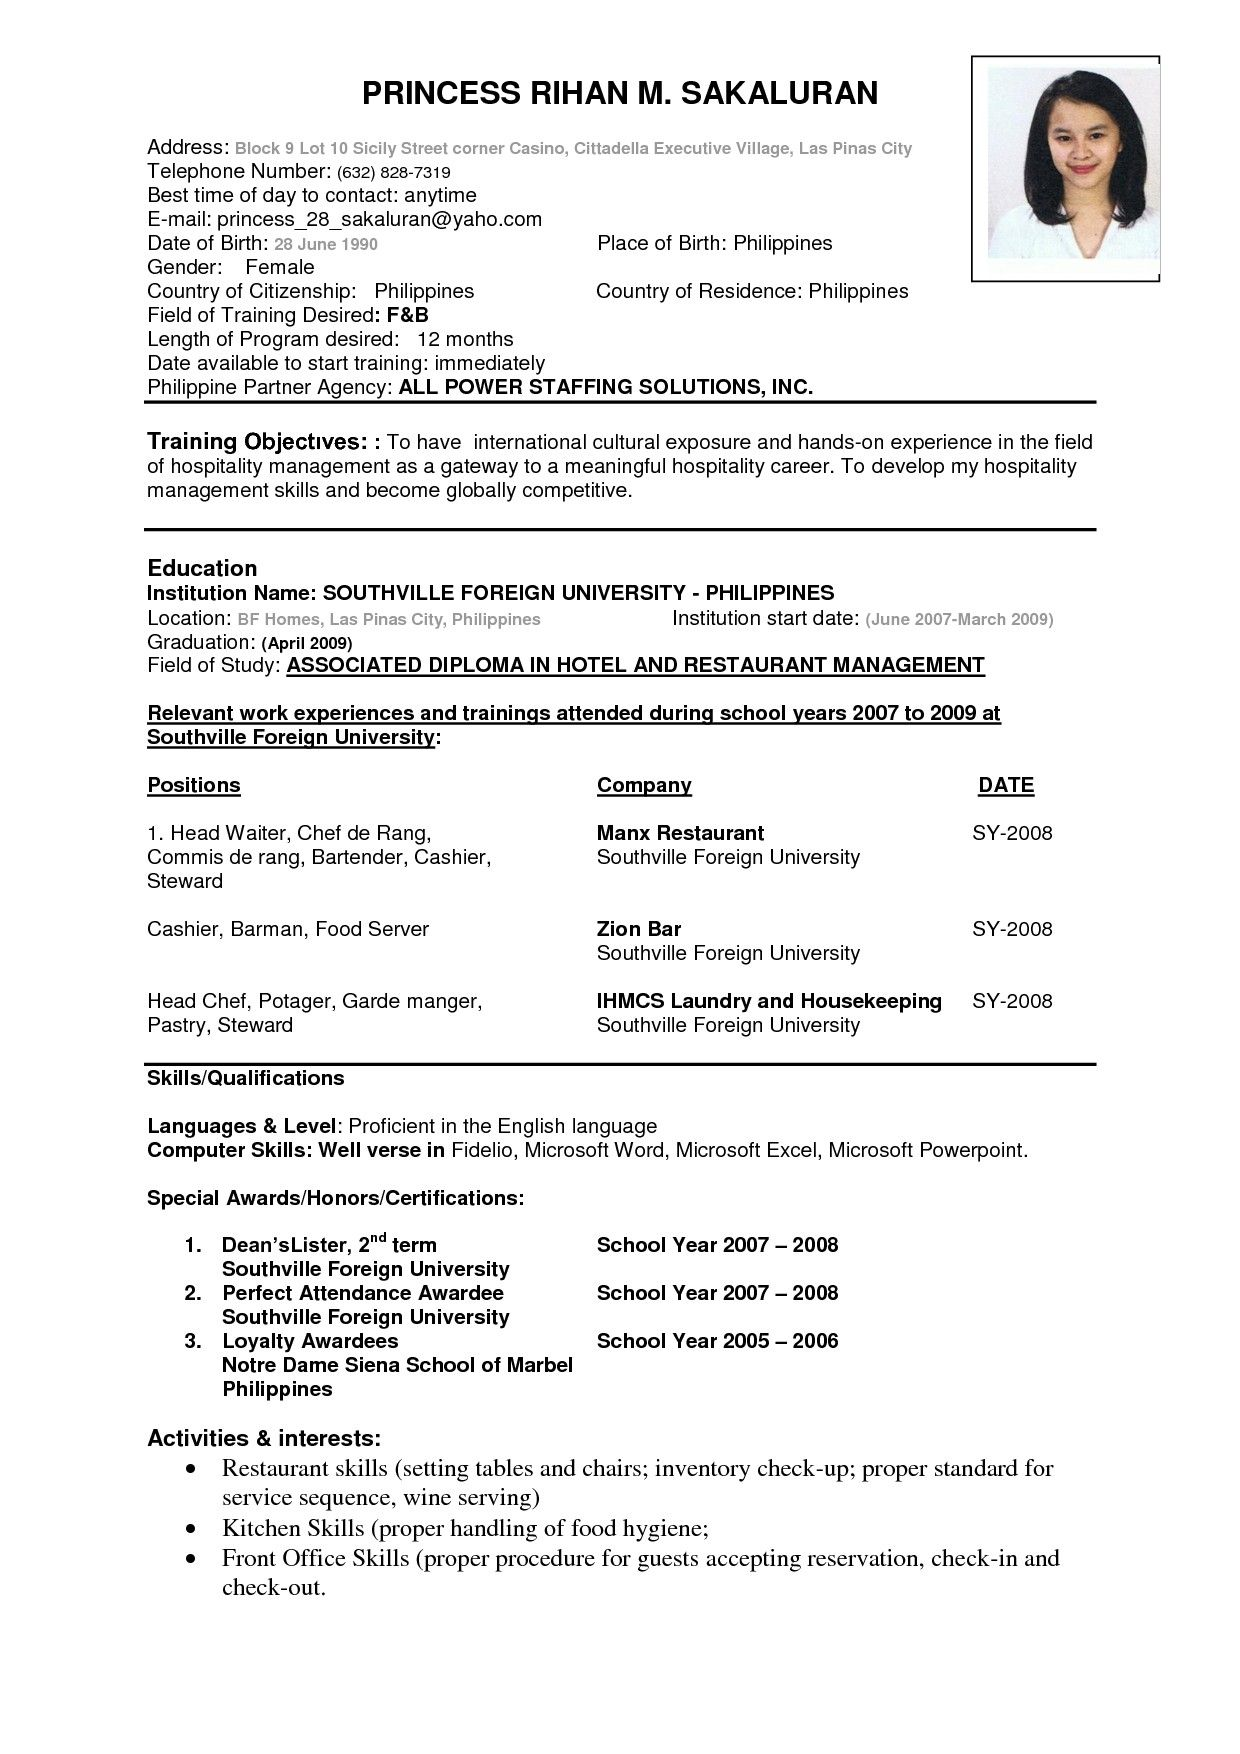 Resume Format Checker | Pinterest | Resume format, Business planning ...